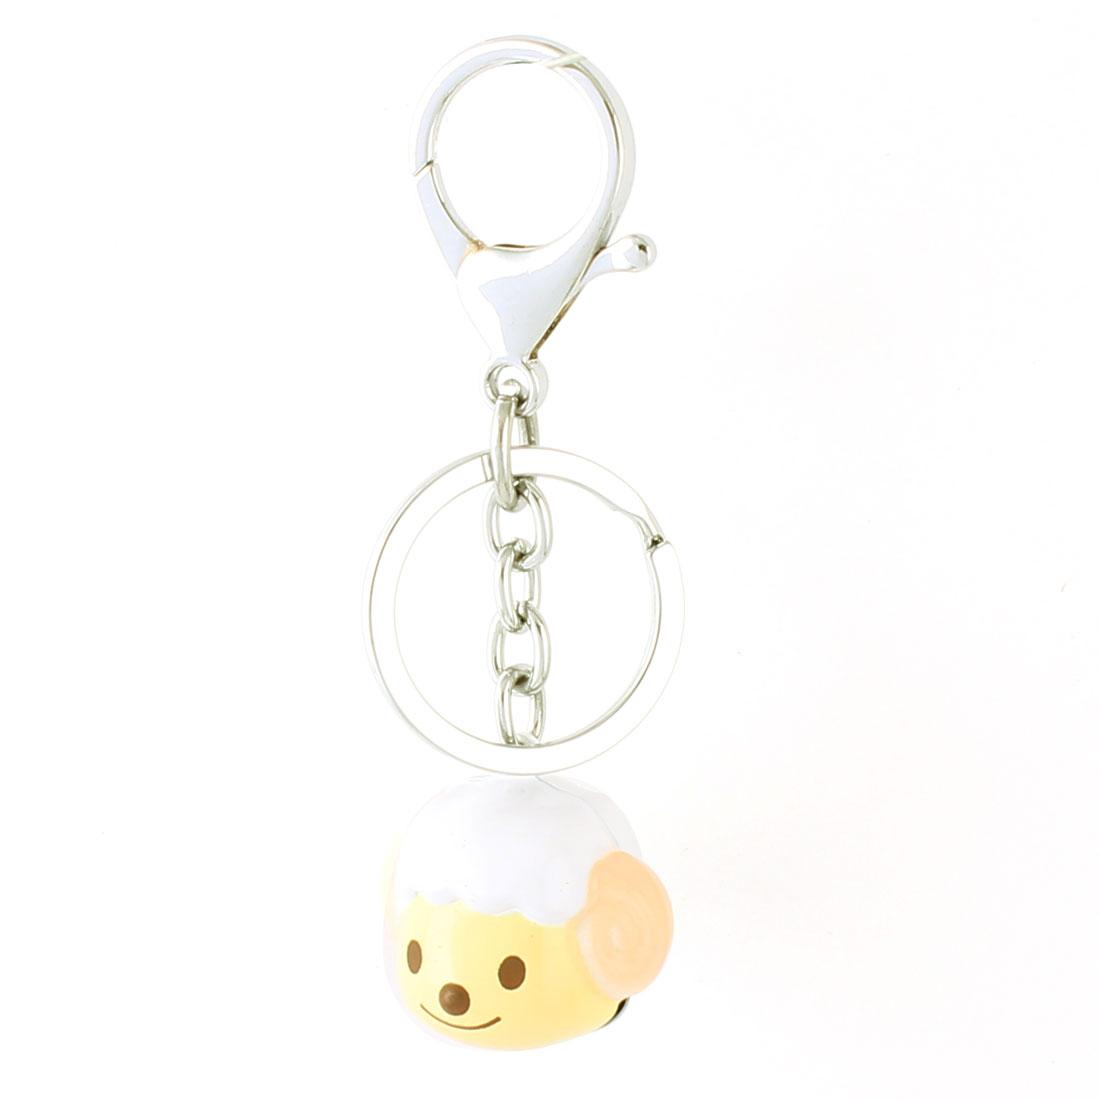 White Yellow Dangling Sheep Head Bells Decor Key Ring Keychain Keyring